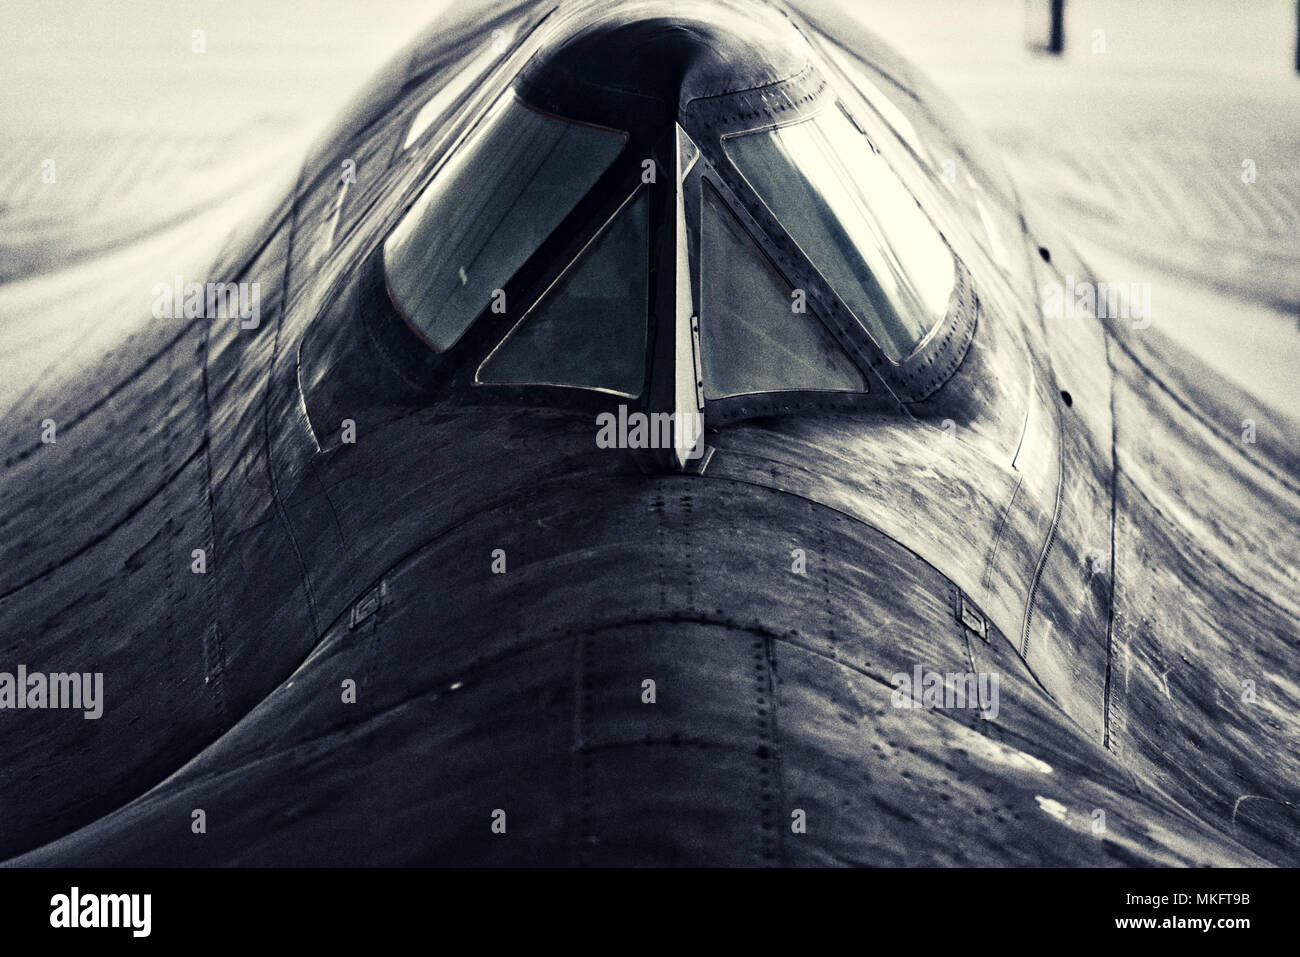 The cockpit canopy of the Lockheed SR-71 Blackbird spy plane